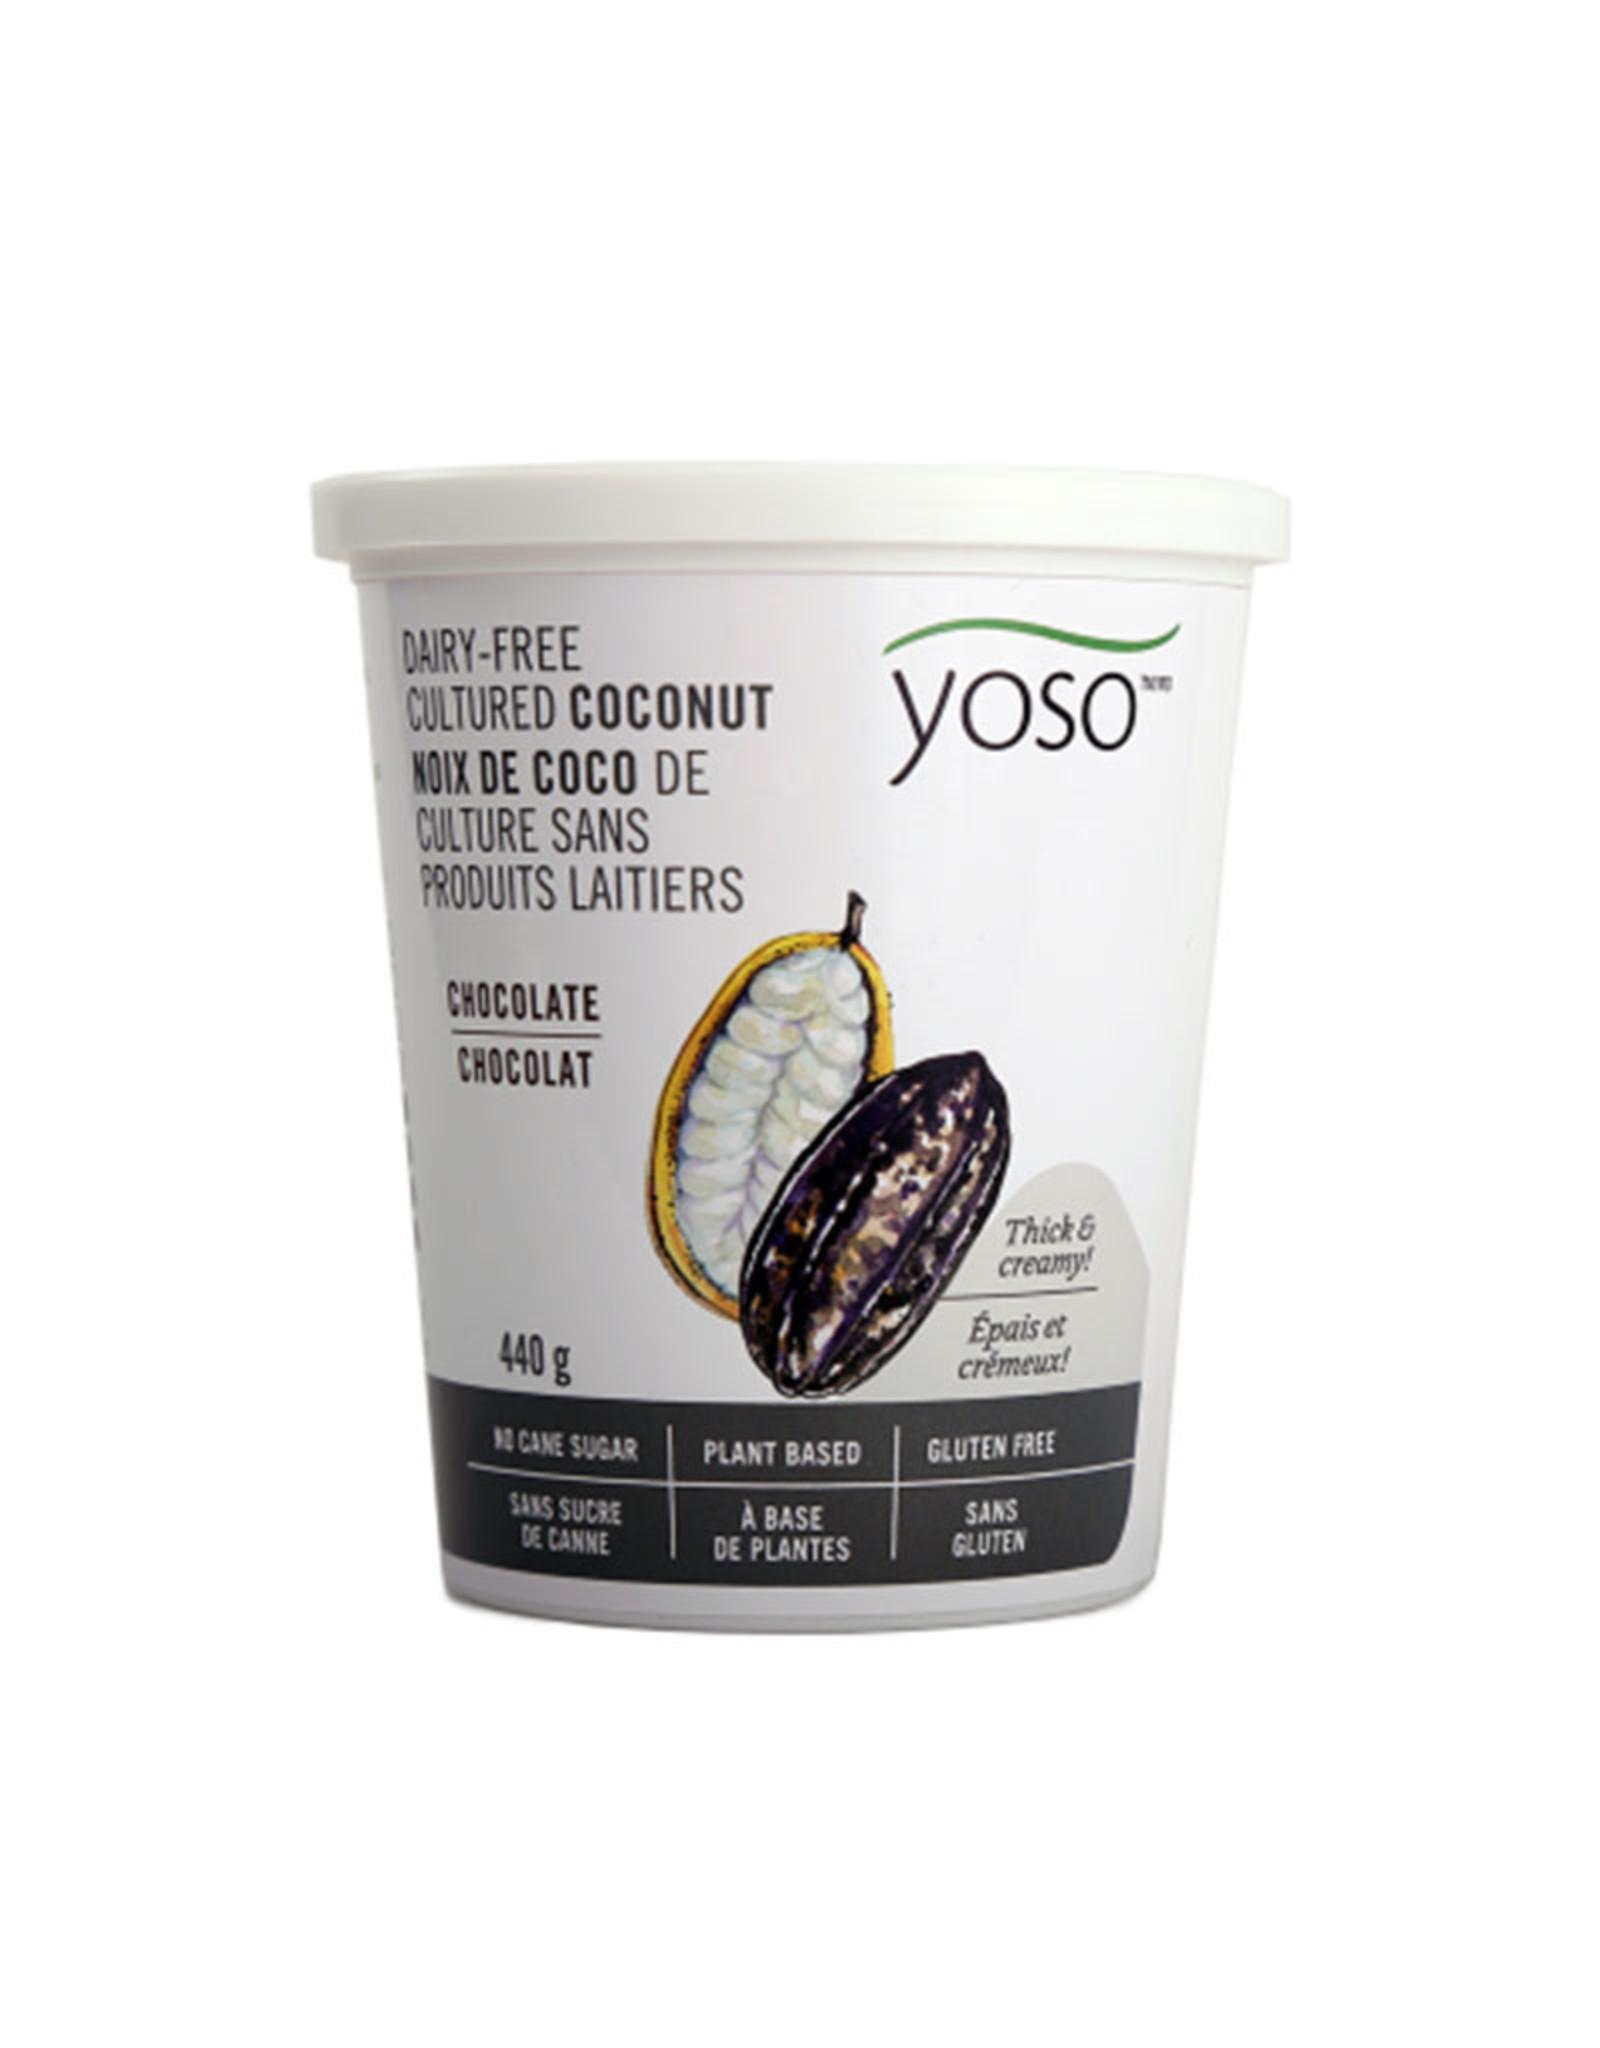 YOSO Yoso - Coconut Yogurt, Chocolate (440g)